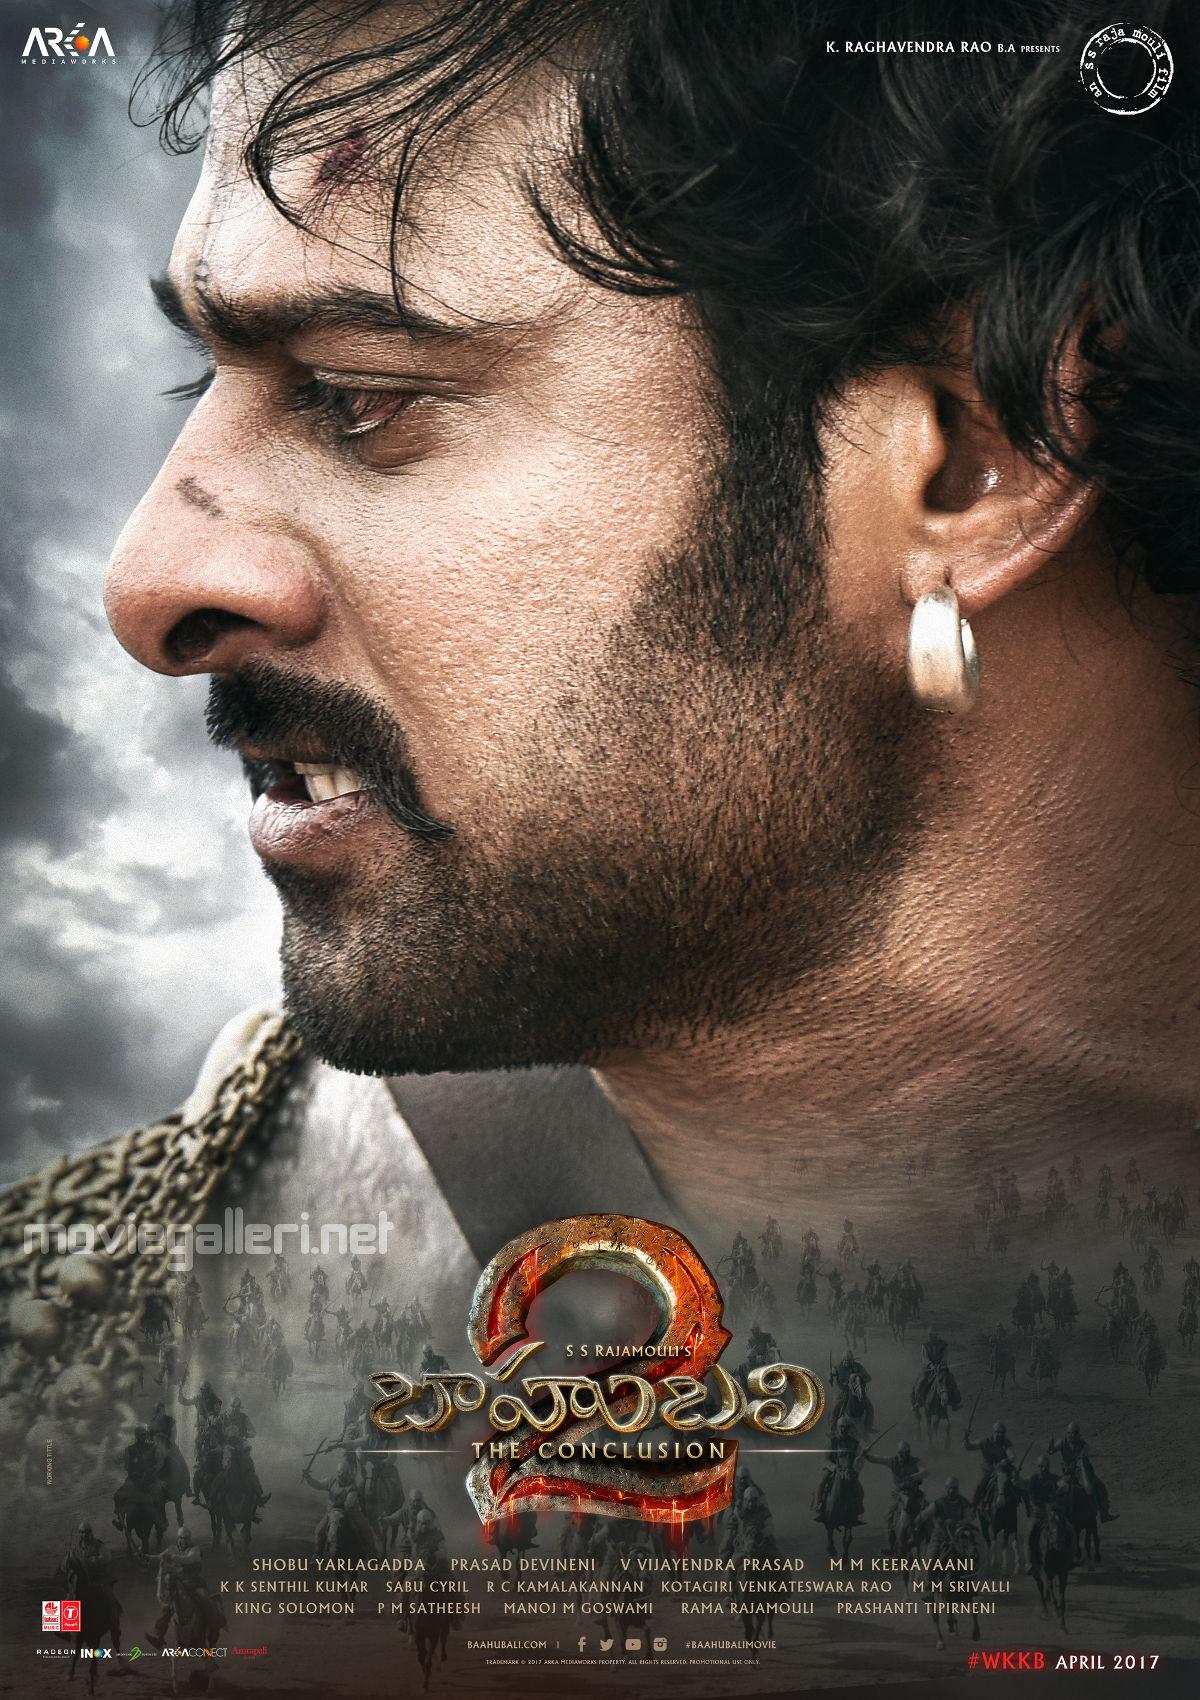 prabhas baahubali 2 latest poster | new movie posters